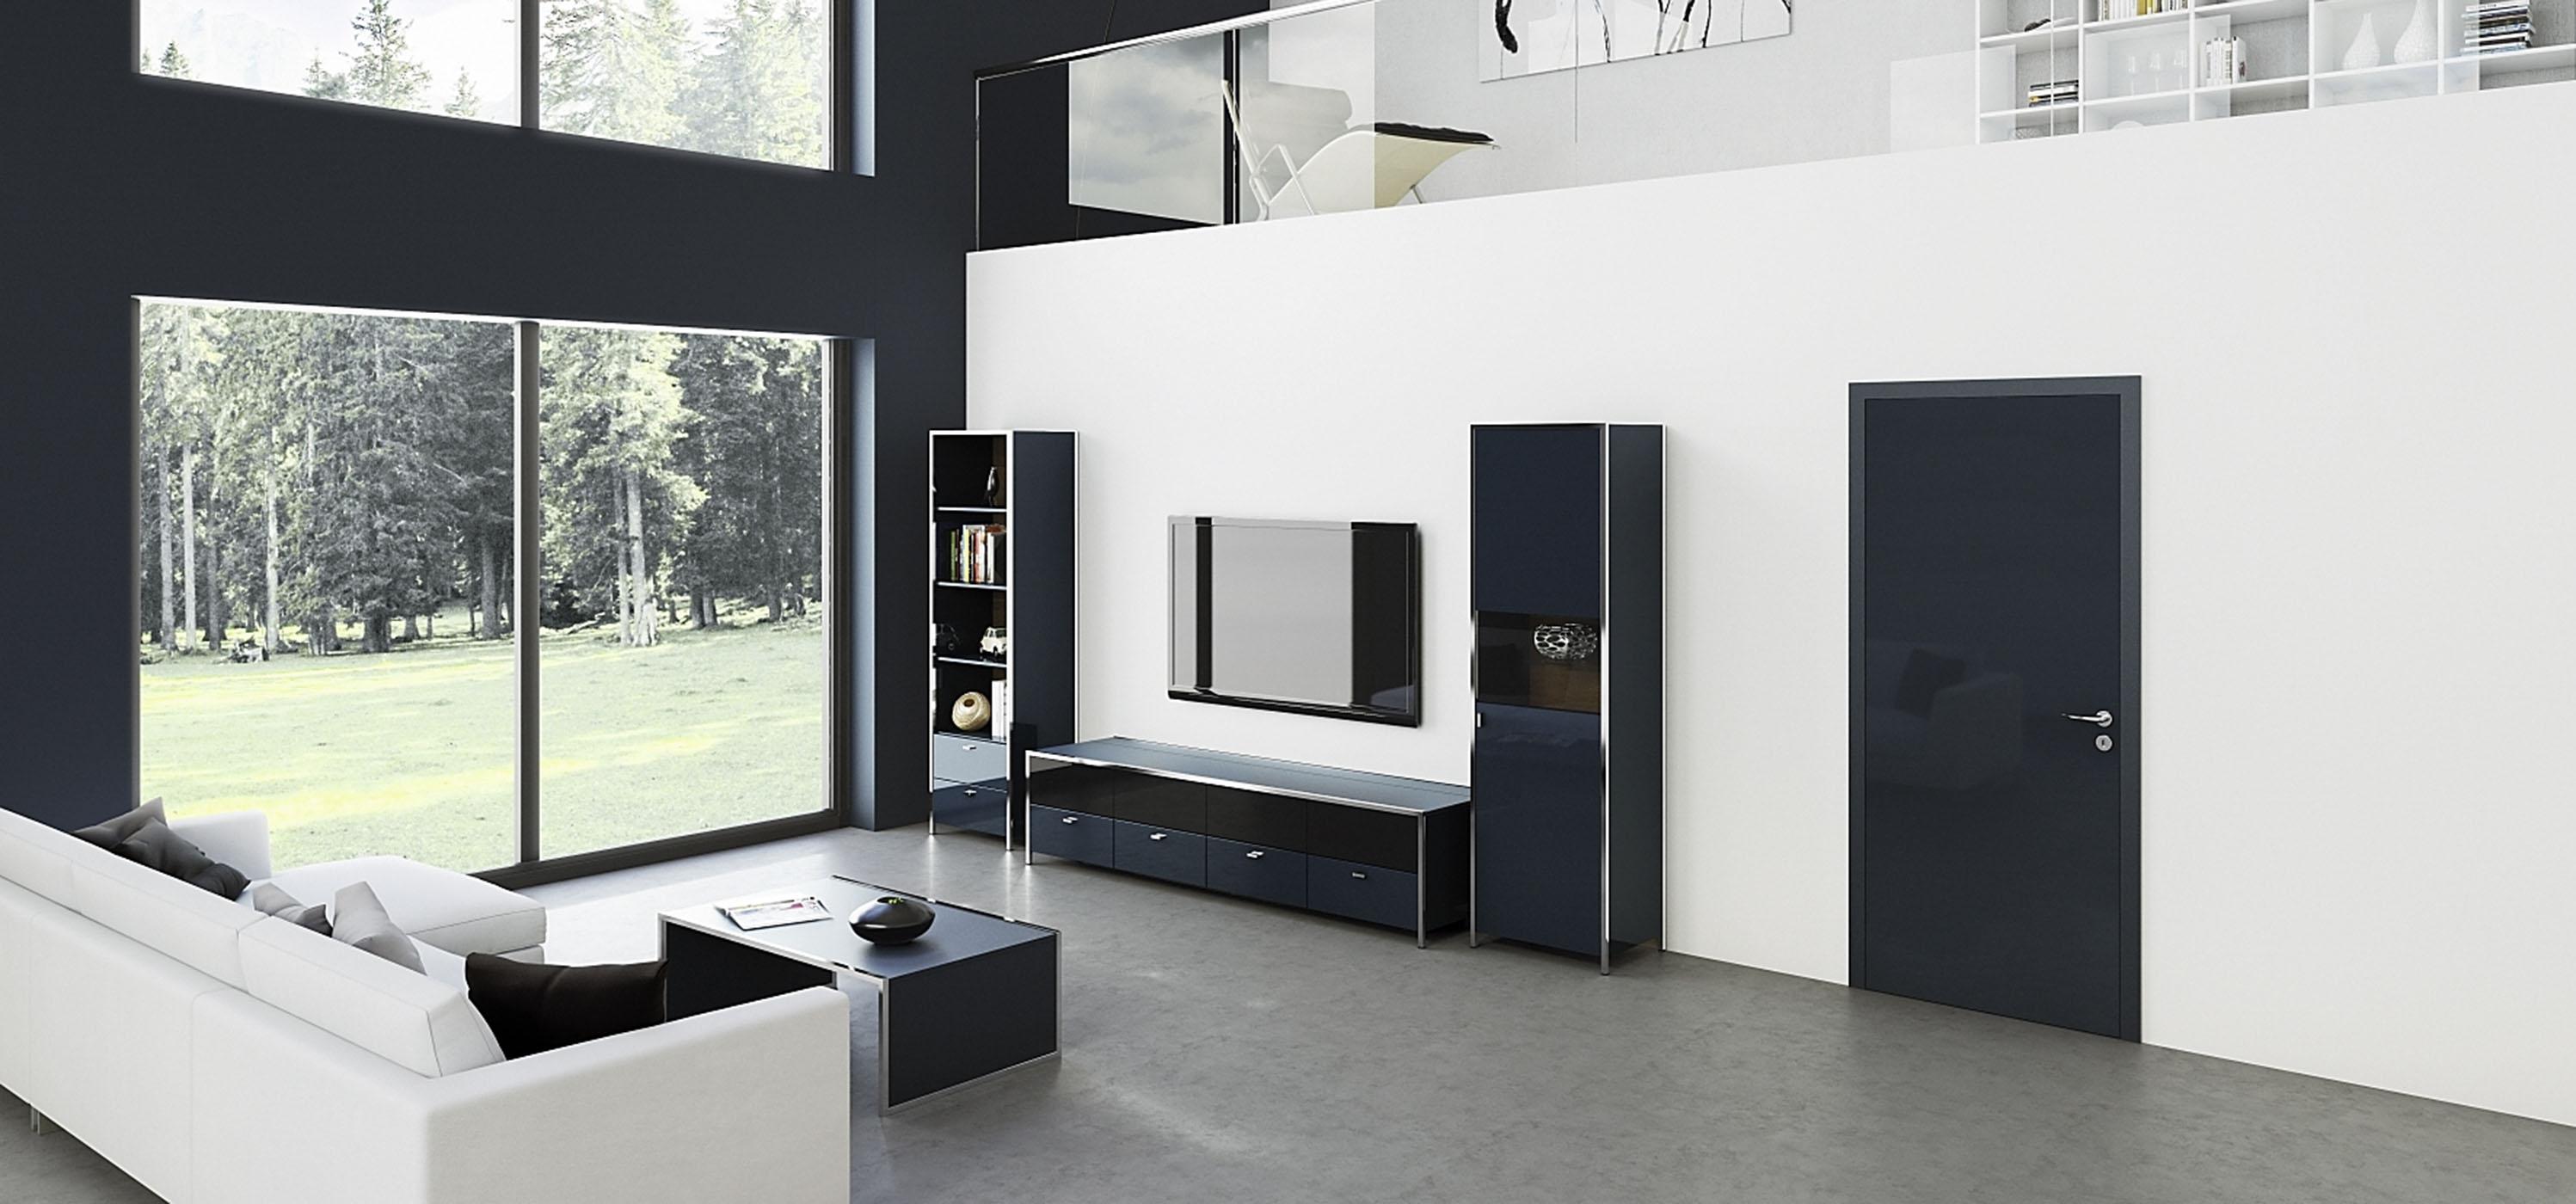 h rmann neue t r designs. Black Bedroom Furniture Sets. Home Design Ideas